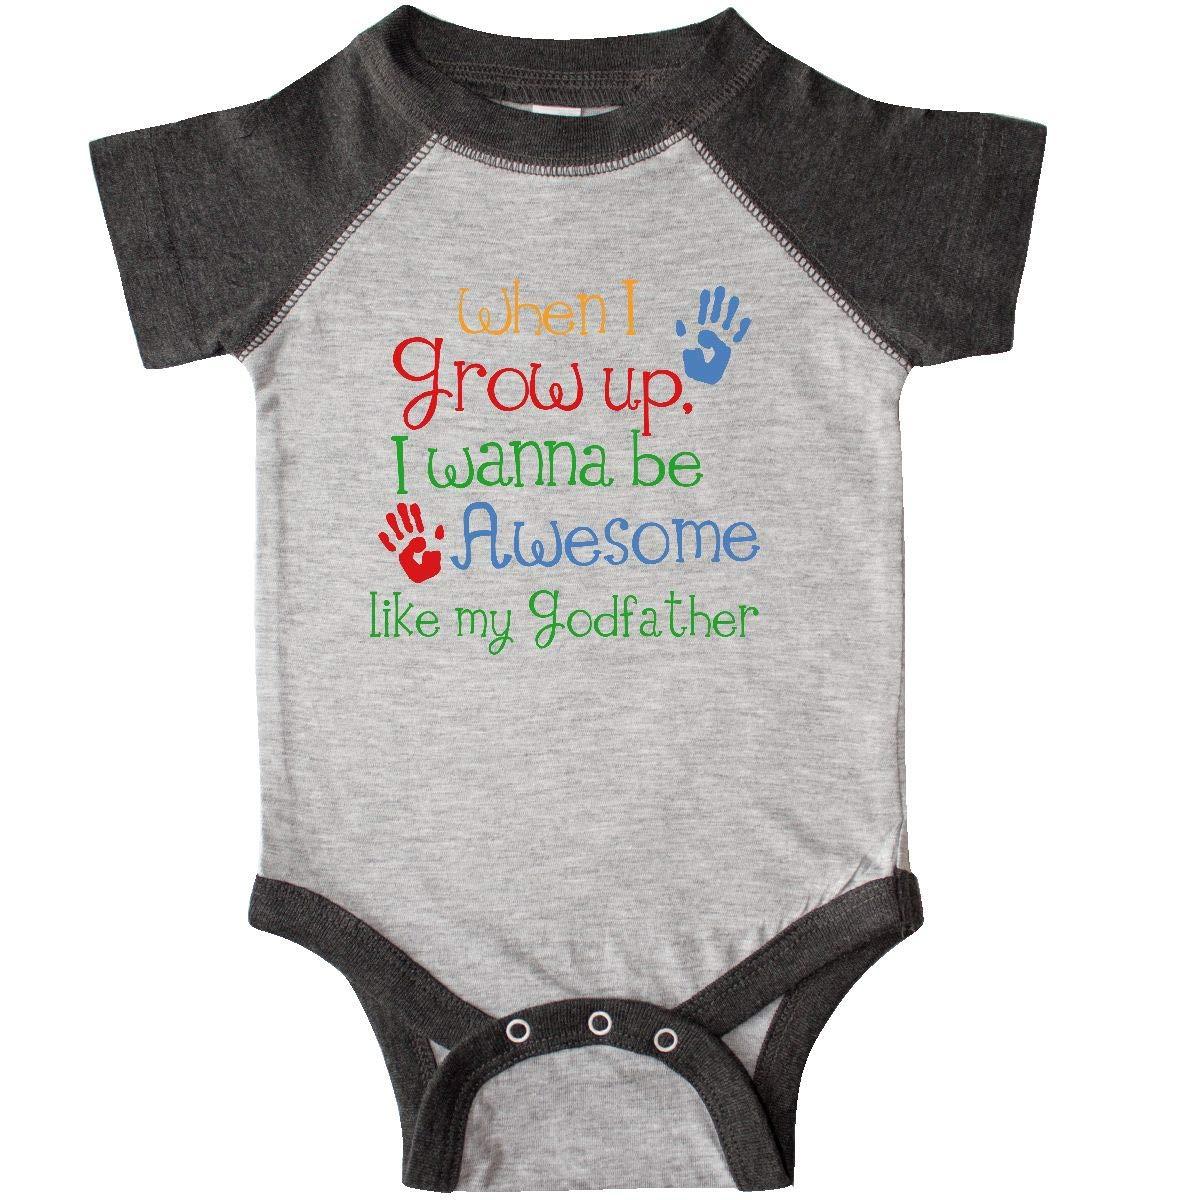 6b9aa122c Amazon.com: inktastic - Awesome Like My Godfather Infant Creeper 19b02:  Clothing